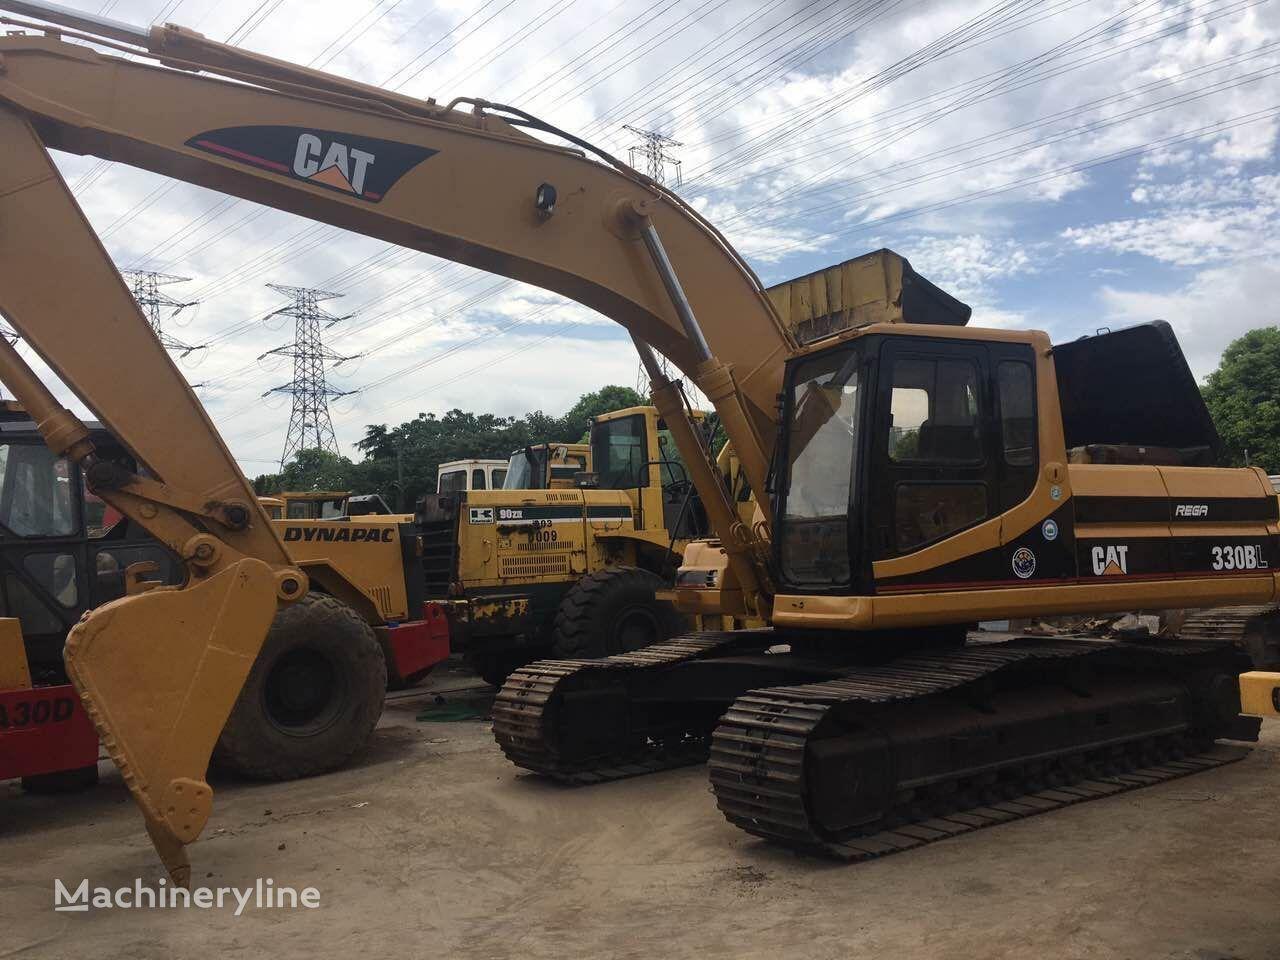 CATERPILLAR 330B tracked excavator